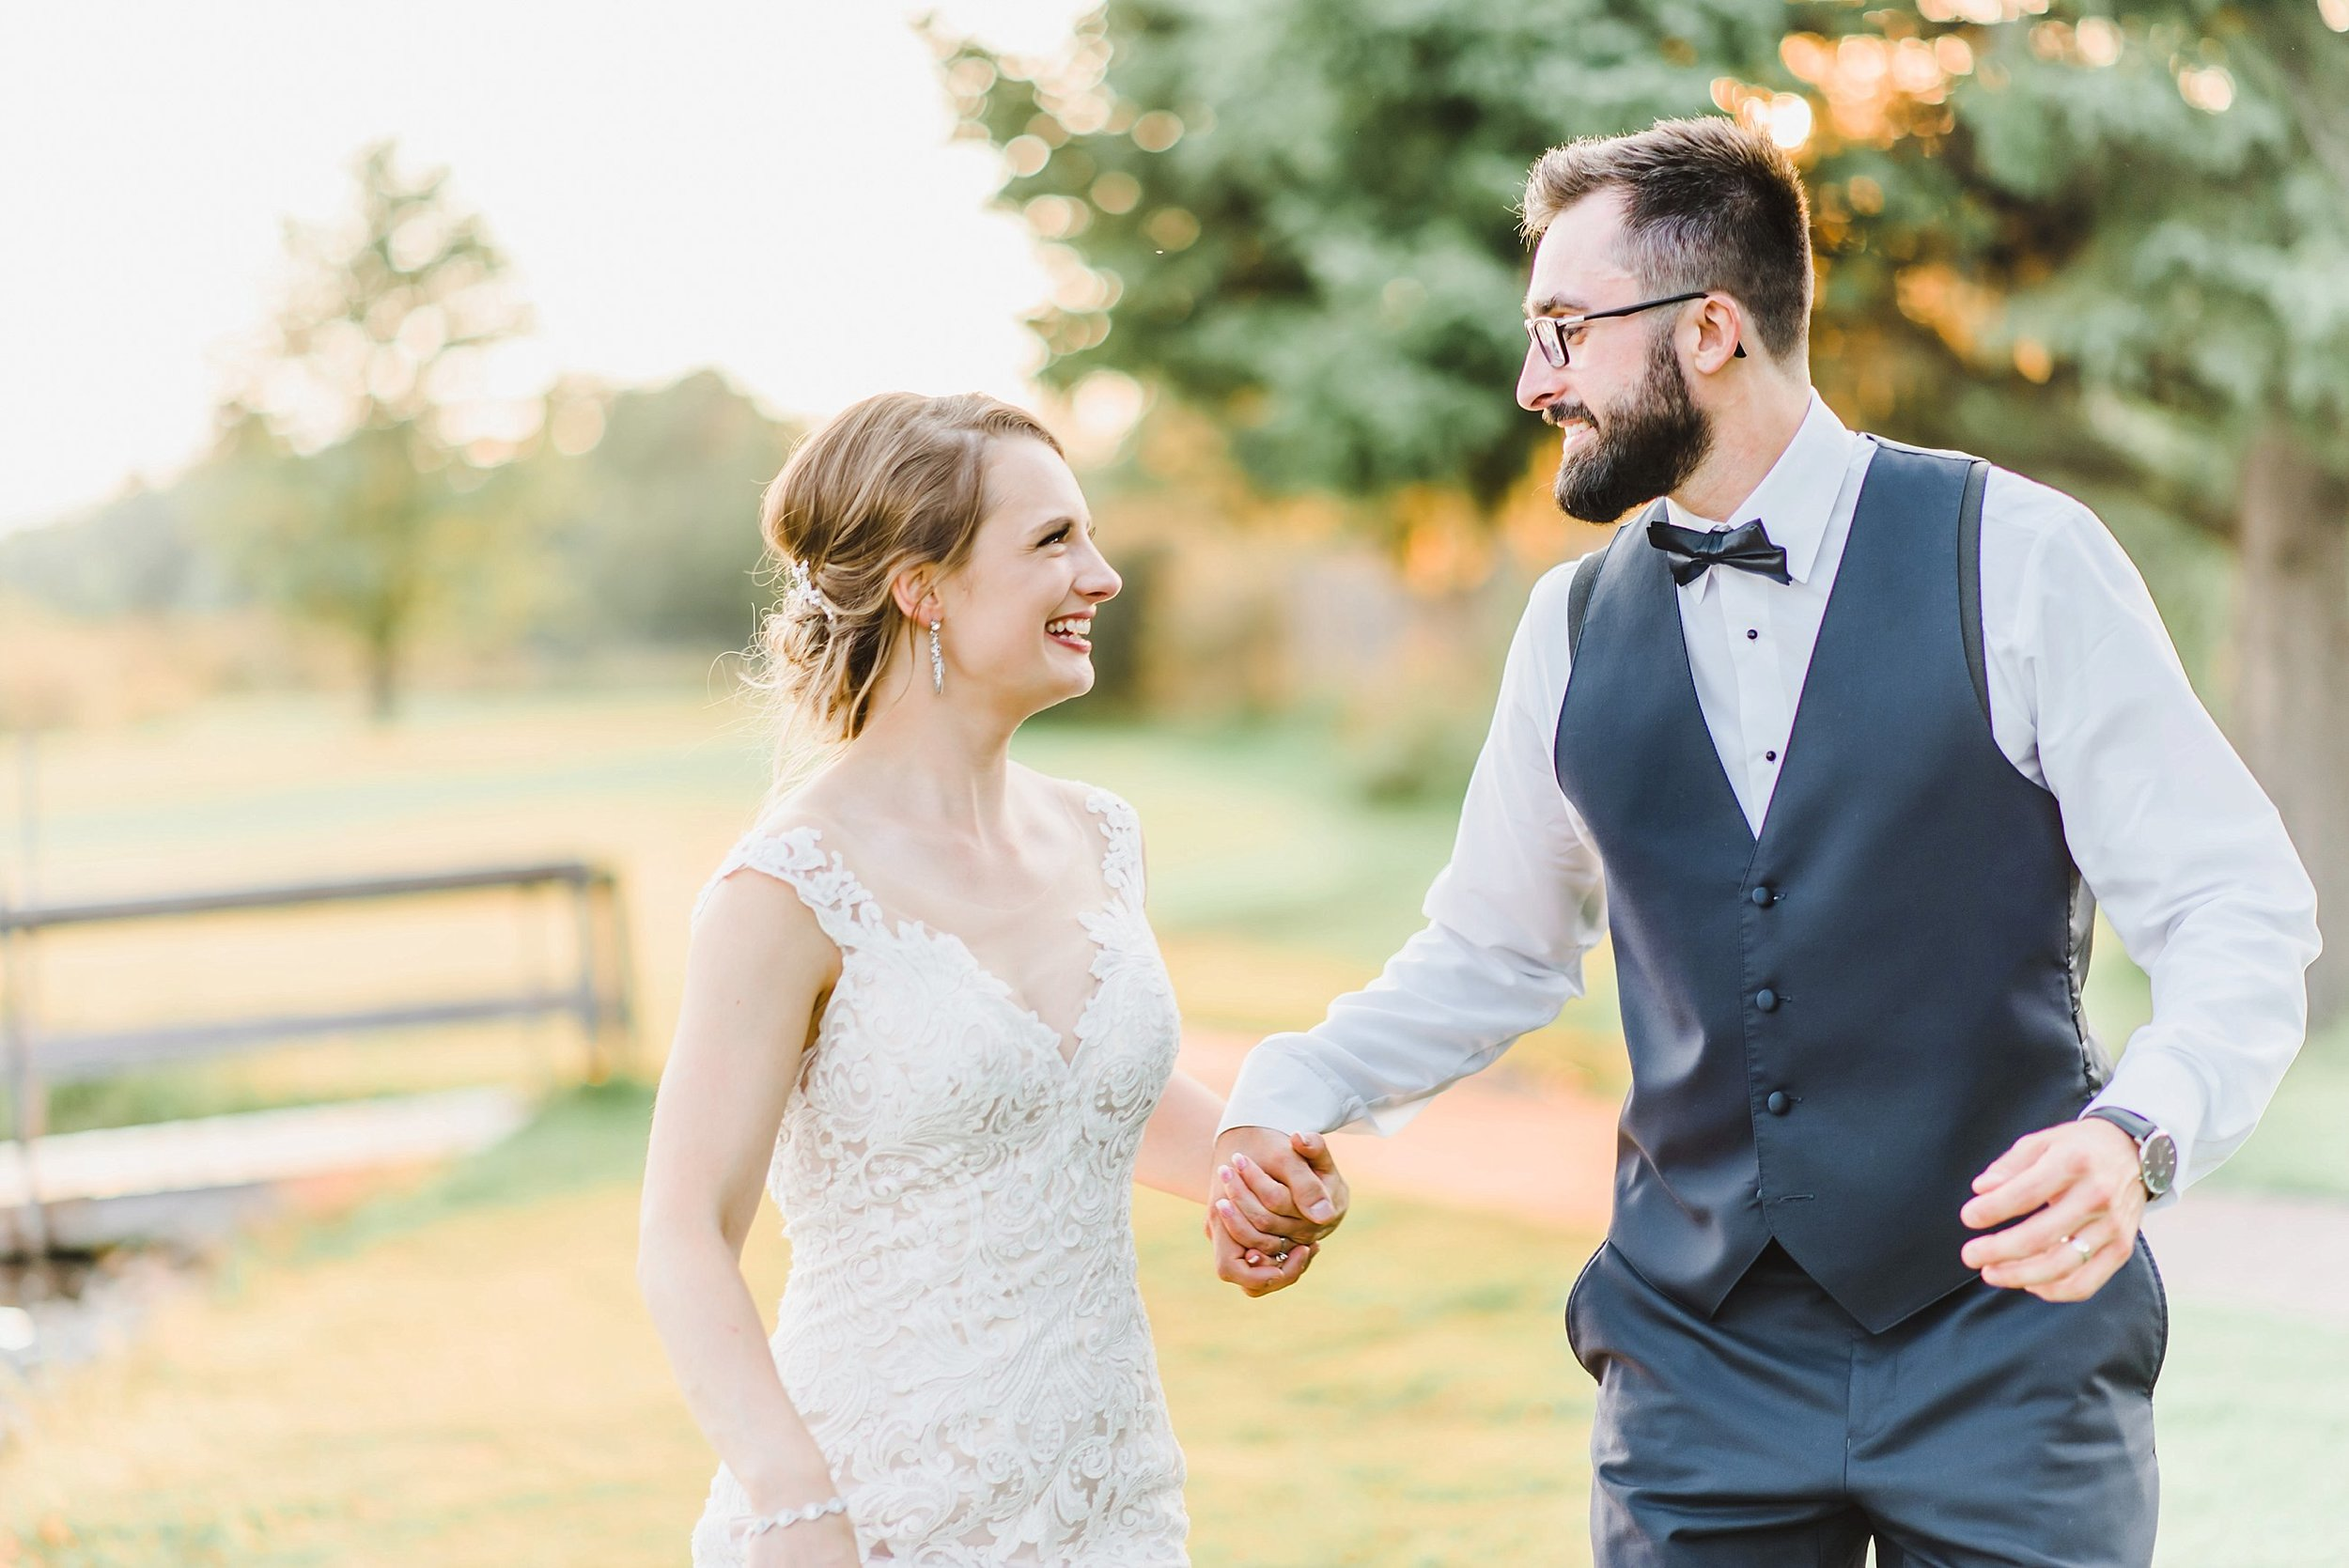 light airy indie fine art ottawa wedding photographer | Ali and Batoul Photography_1349.jpg